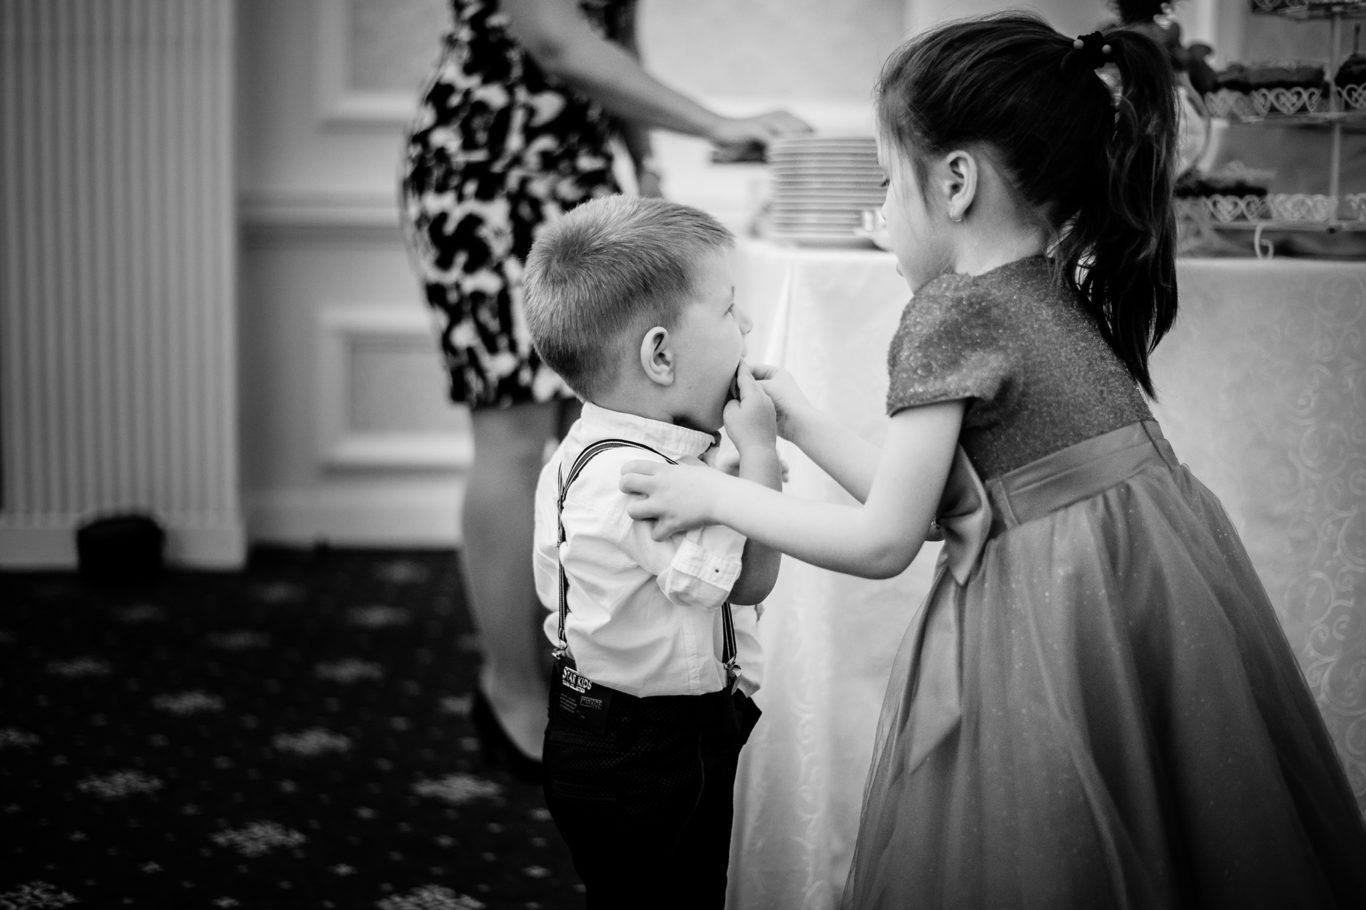 0503-fotografie-nunta-bucuresti-anca-george-fotograf-ciprian-dumitrescu-dsc_9015